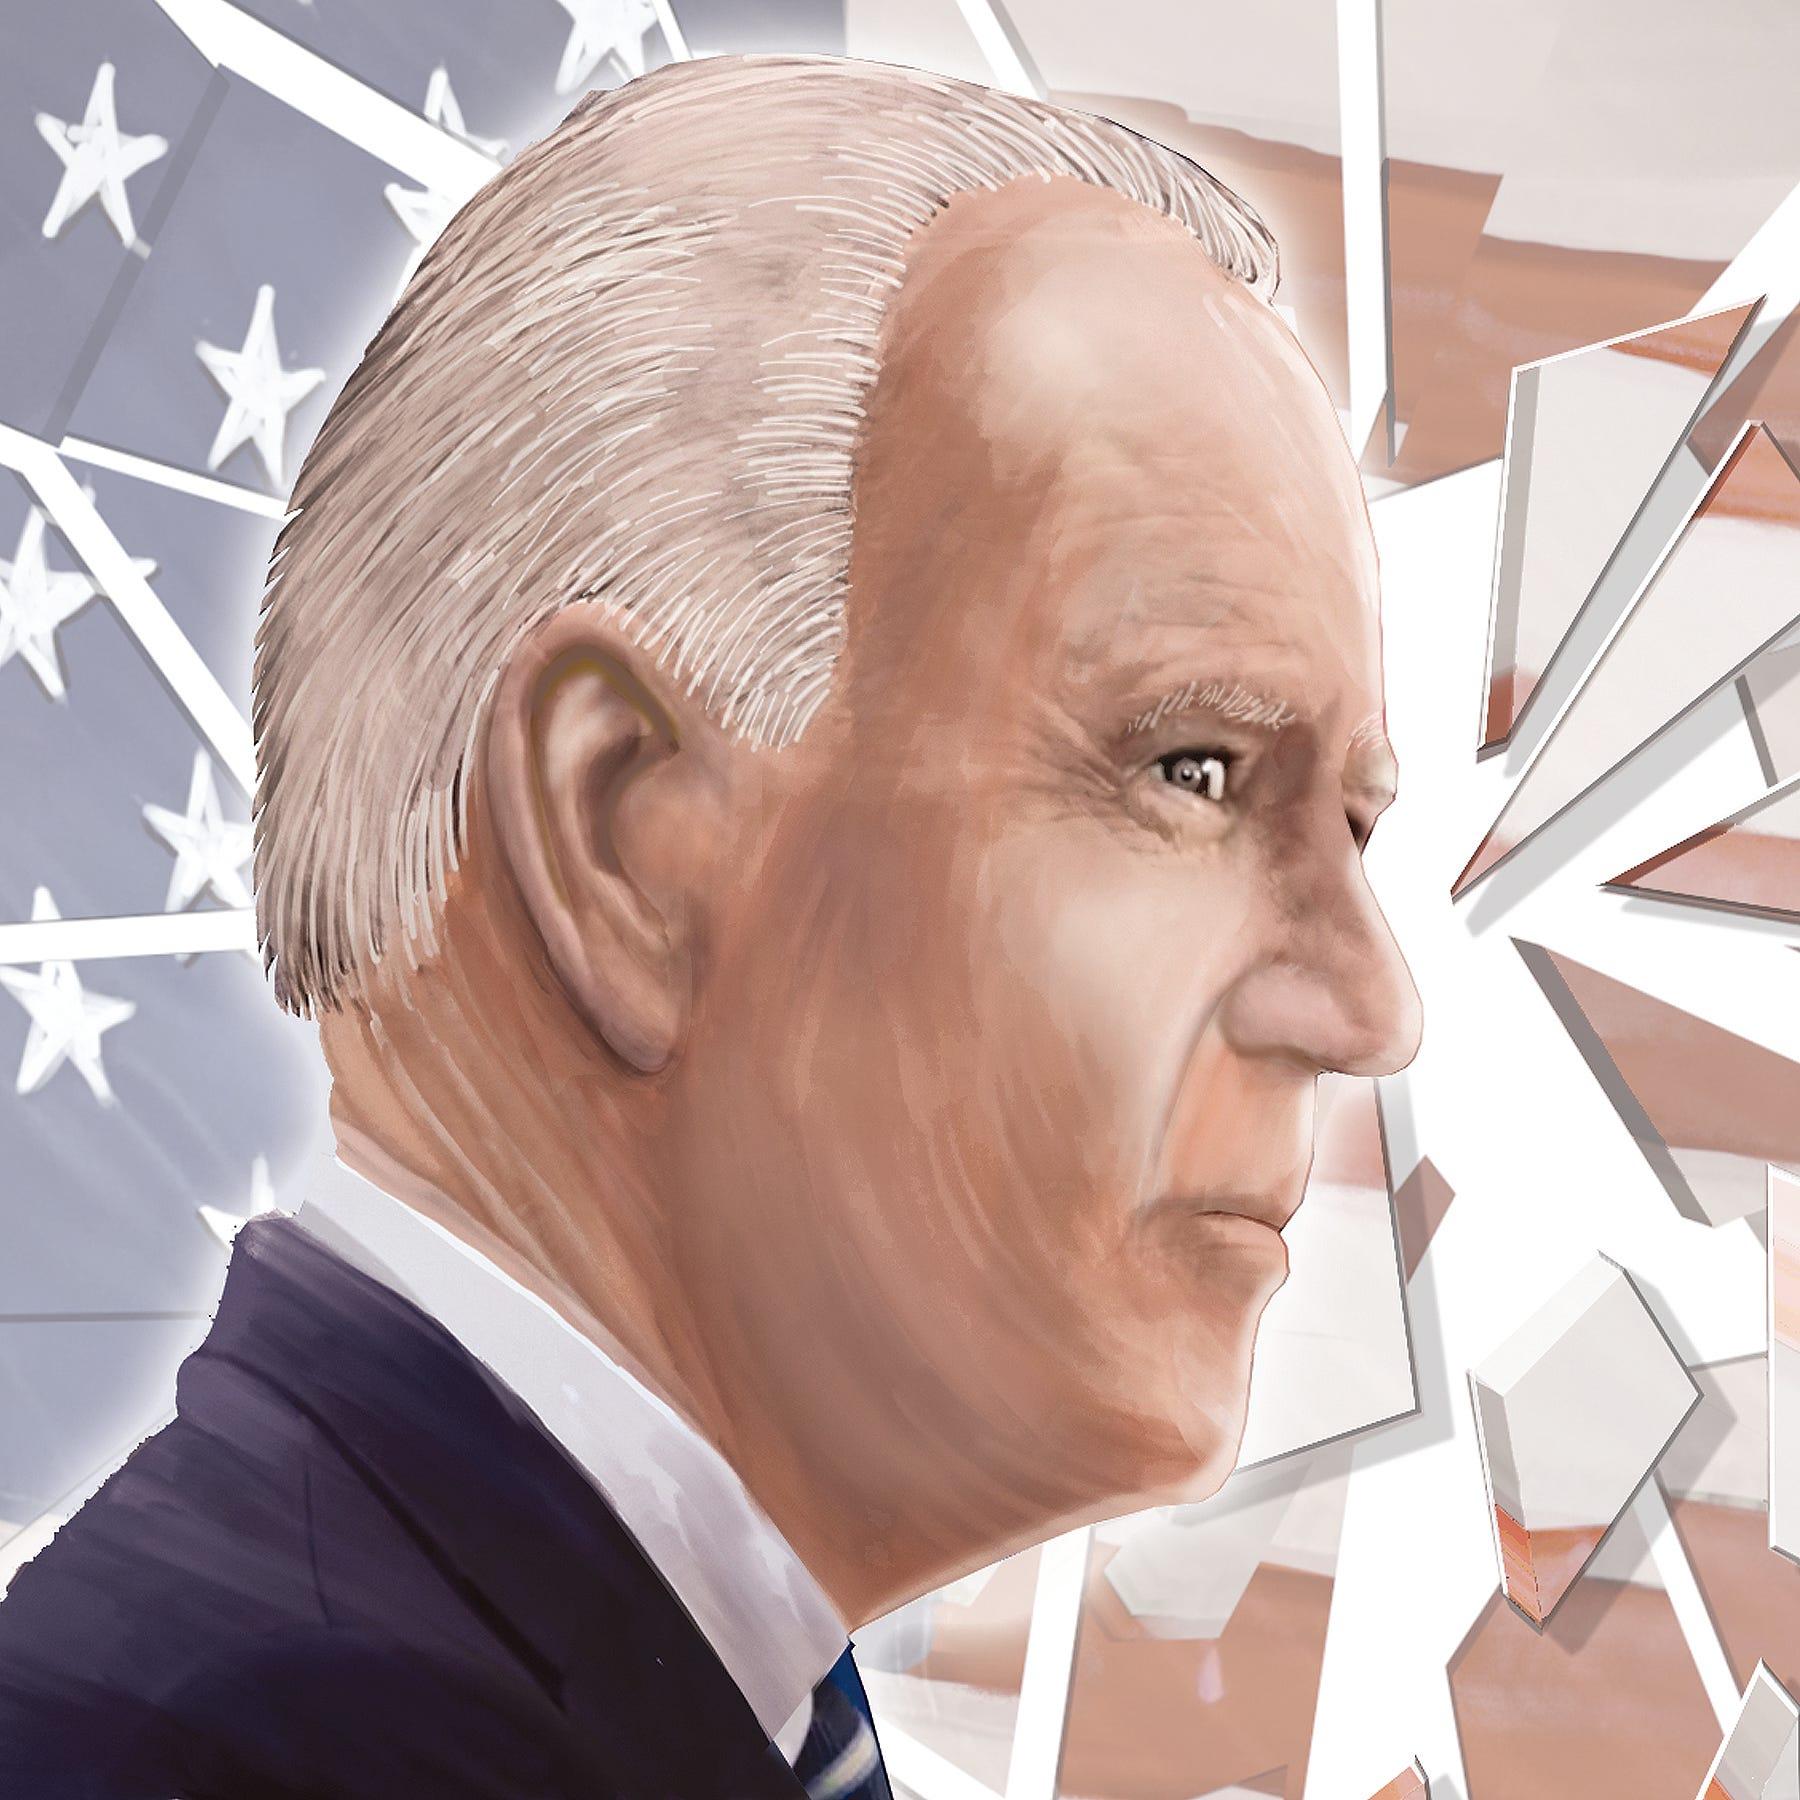 freep.com - Detroit Free Press Editorial Board, Detroit Free Press - Endorsement: Joe Biden is the anti-toxin America needs